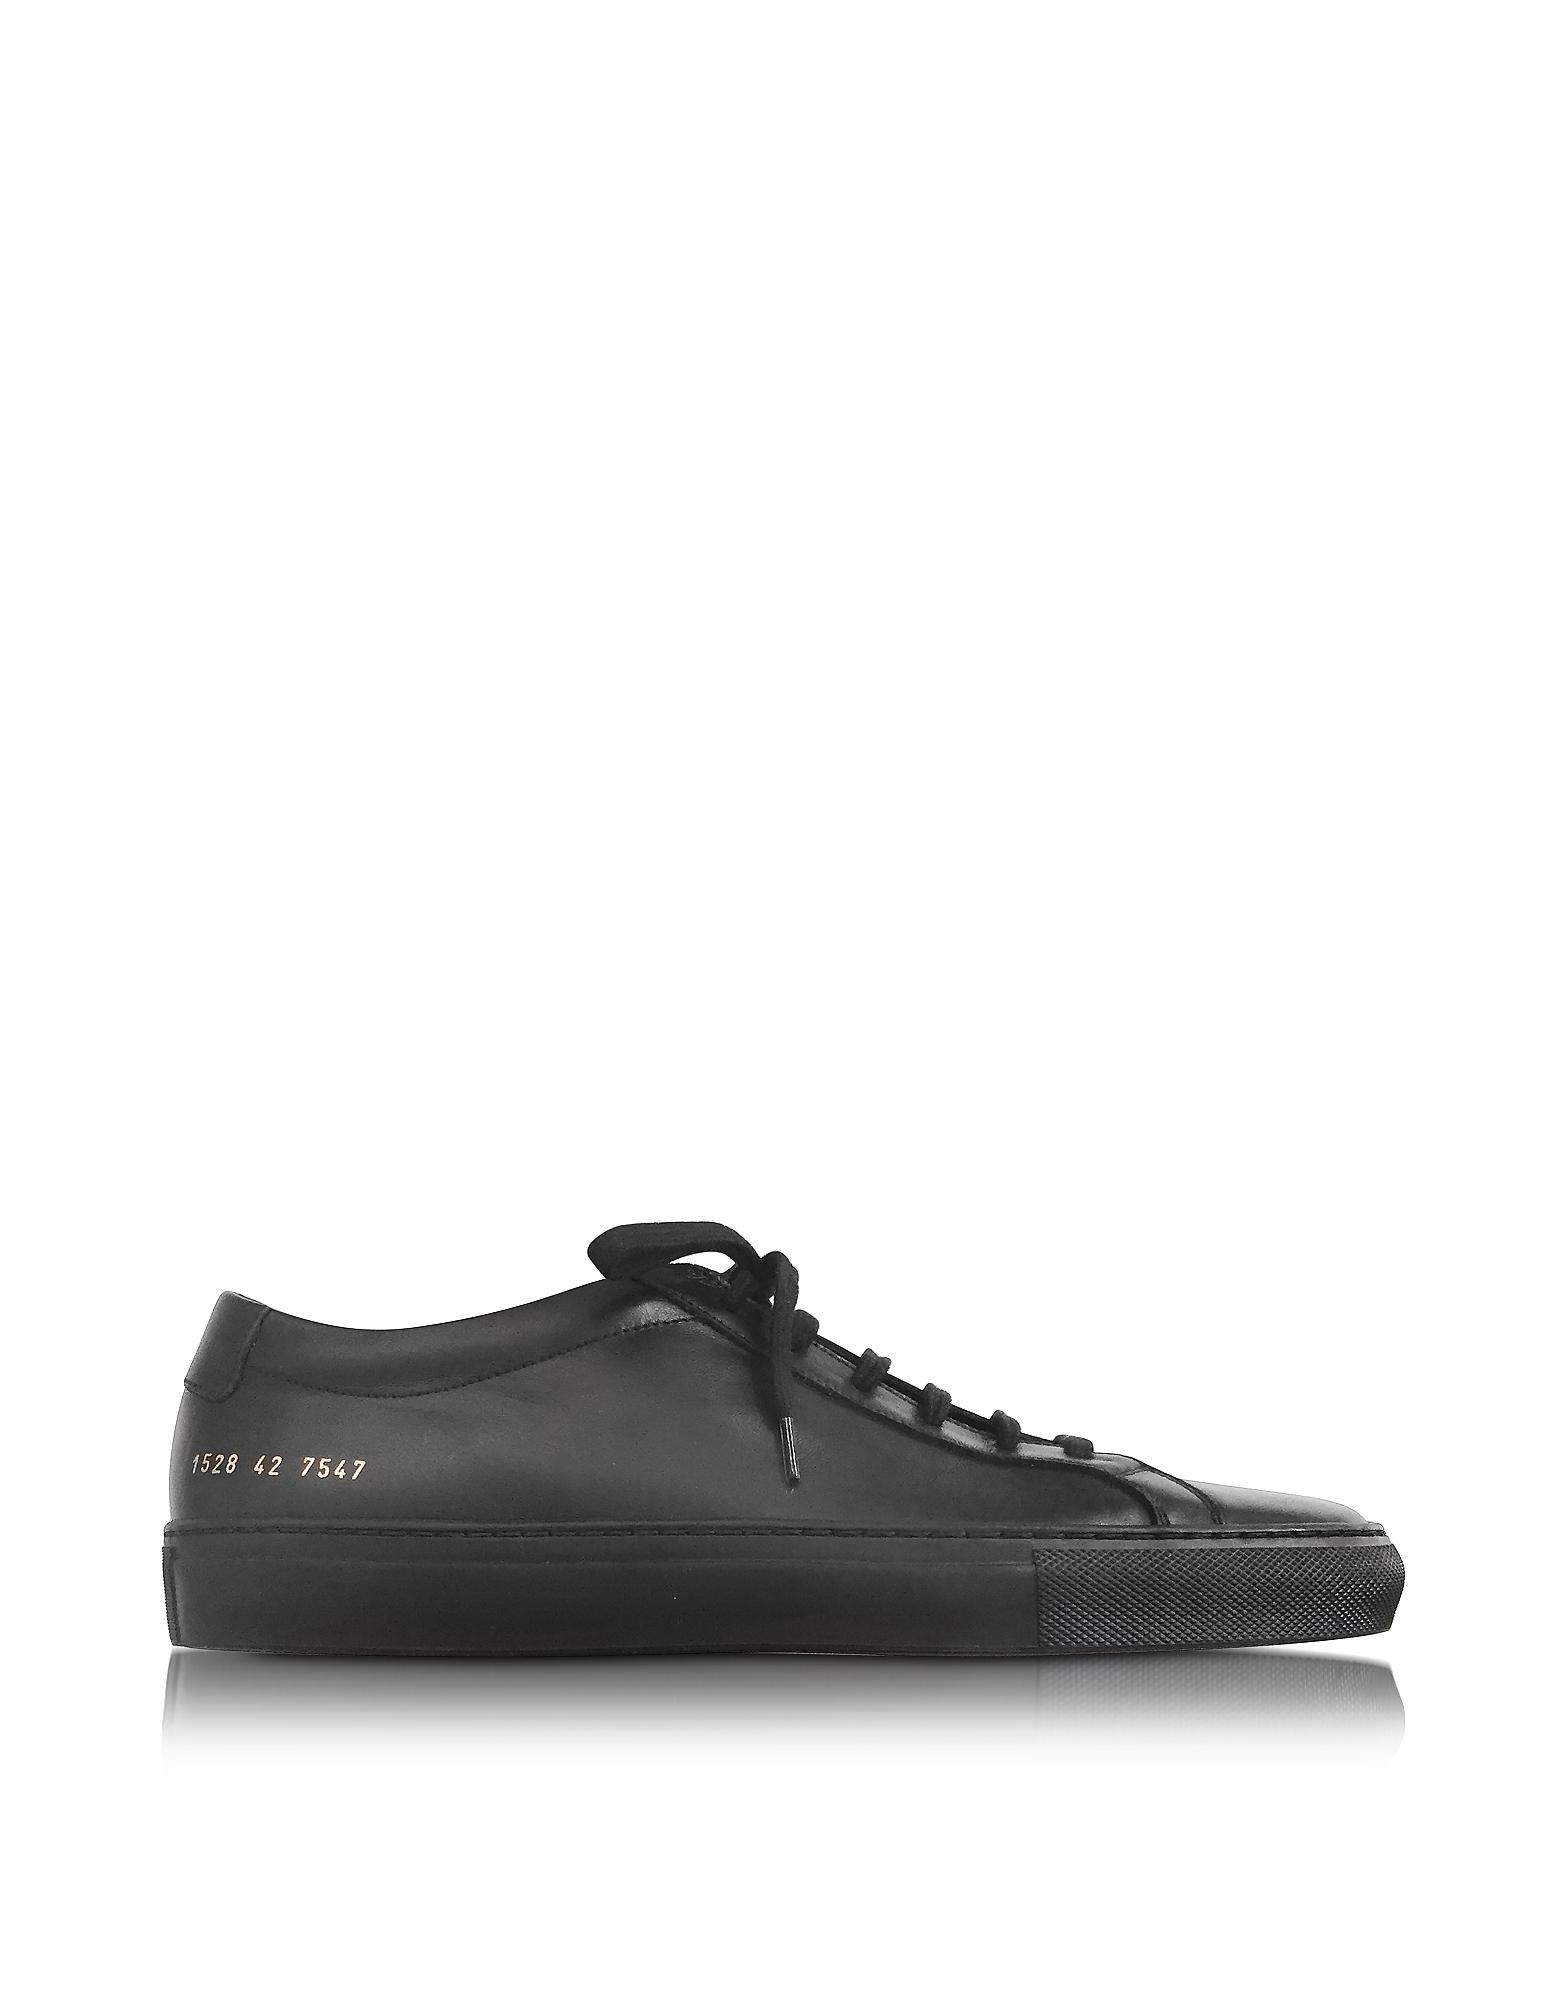 Original Achilles Low Sneaker da Uomo in Pelle Nera